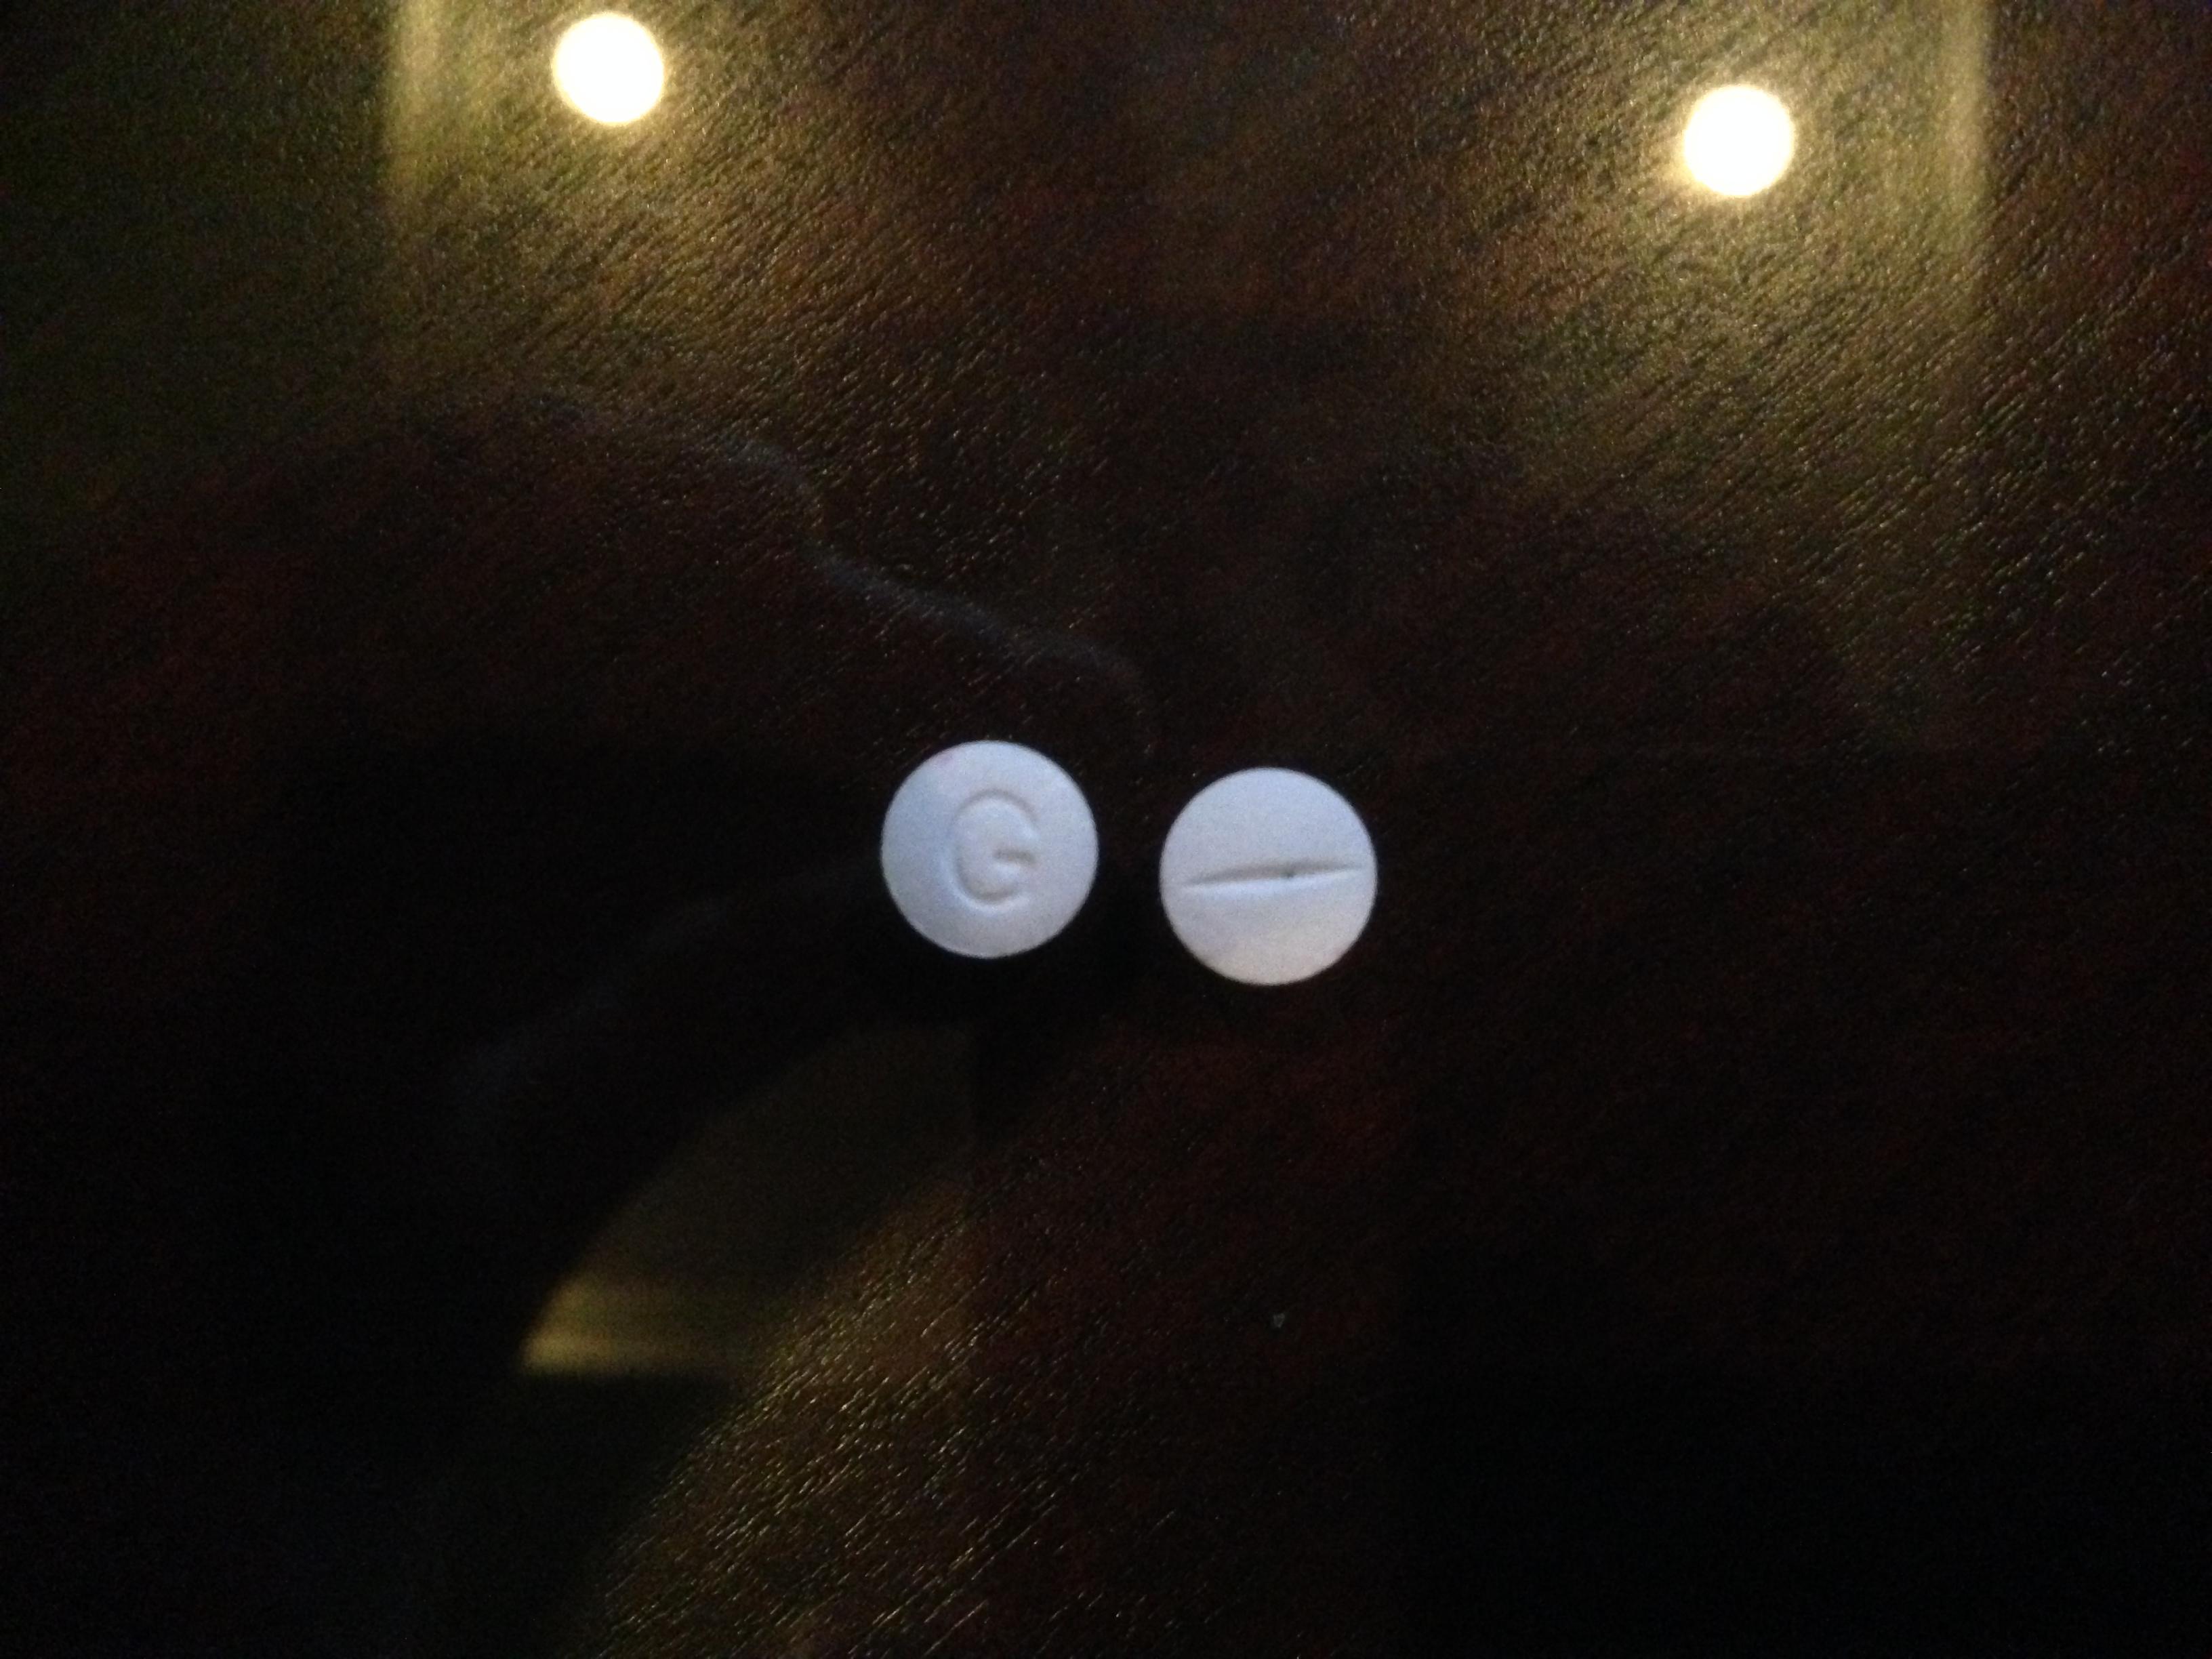 quality vet steroids 2012